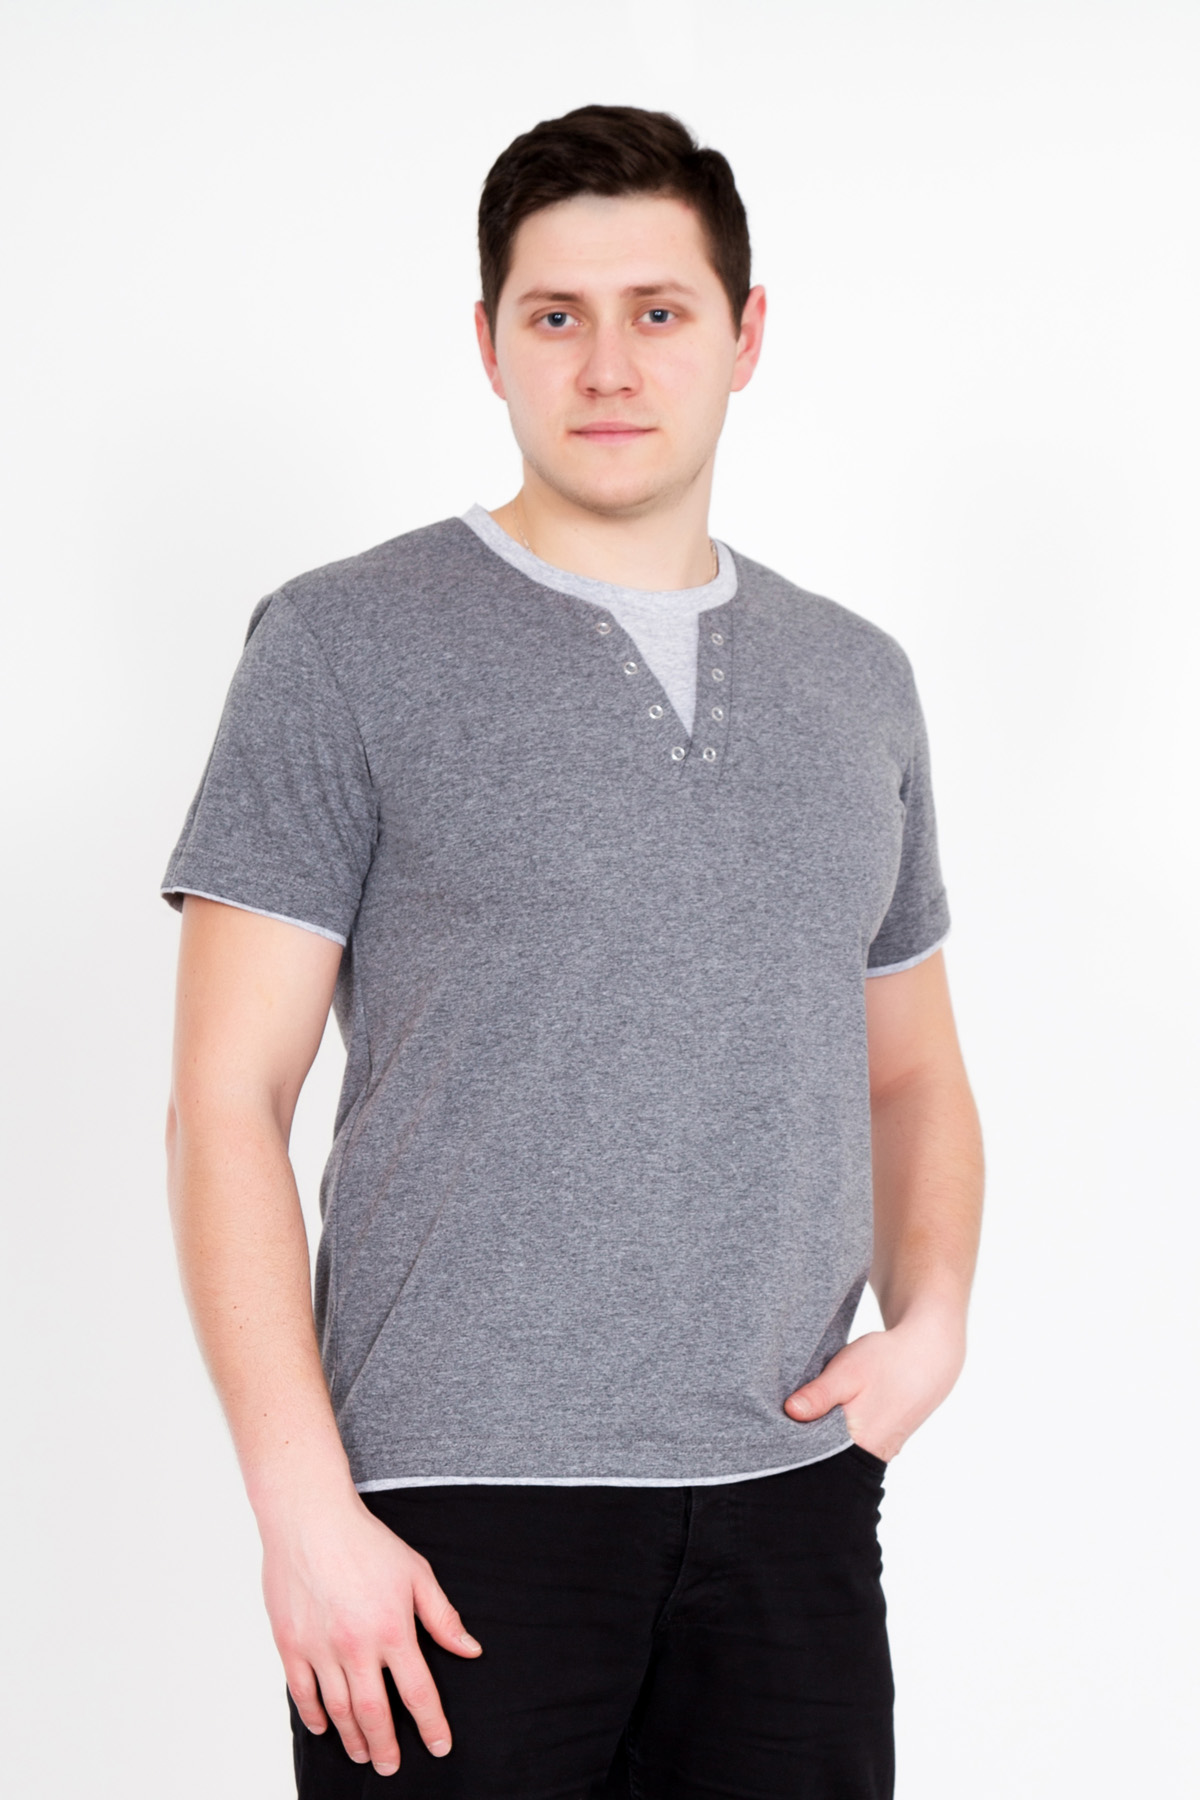 Муж. футболка Джон Серый р. 62Футболки и майки<br>Обхват груди:124 см<br>Обхват талии:118 см<br>Обхват бедер:124 см<br>Длина по спинке:73 см<br>Рост:178-188 см<br><br>Тип: Муж. футболка<br>Размер: 62<br>Материал: Кулирка